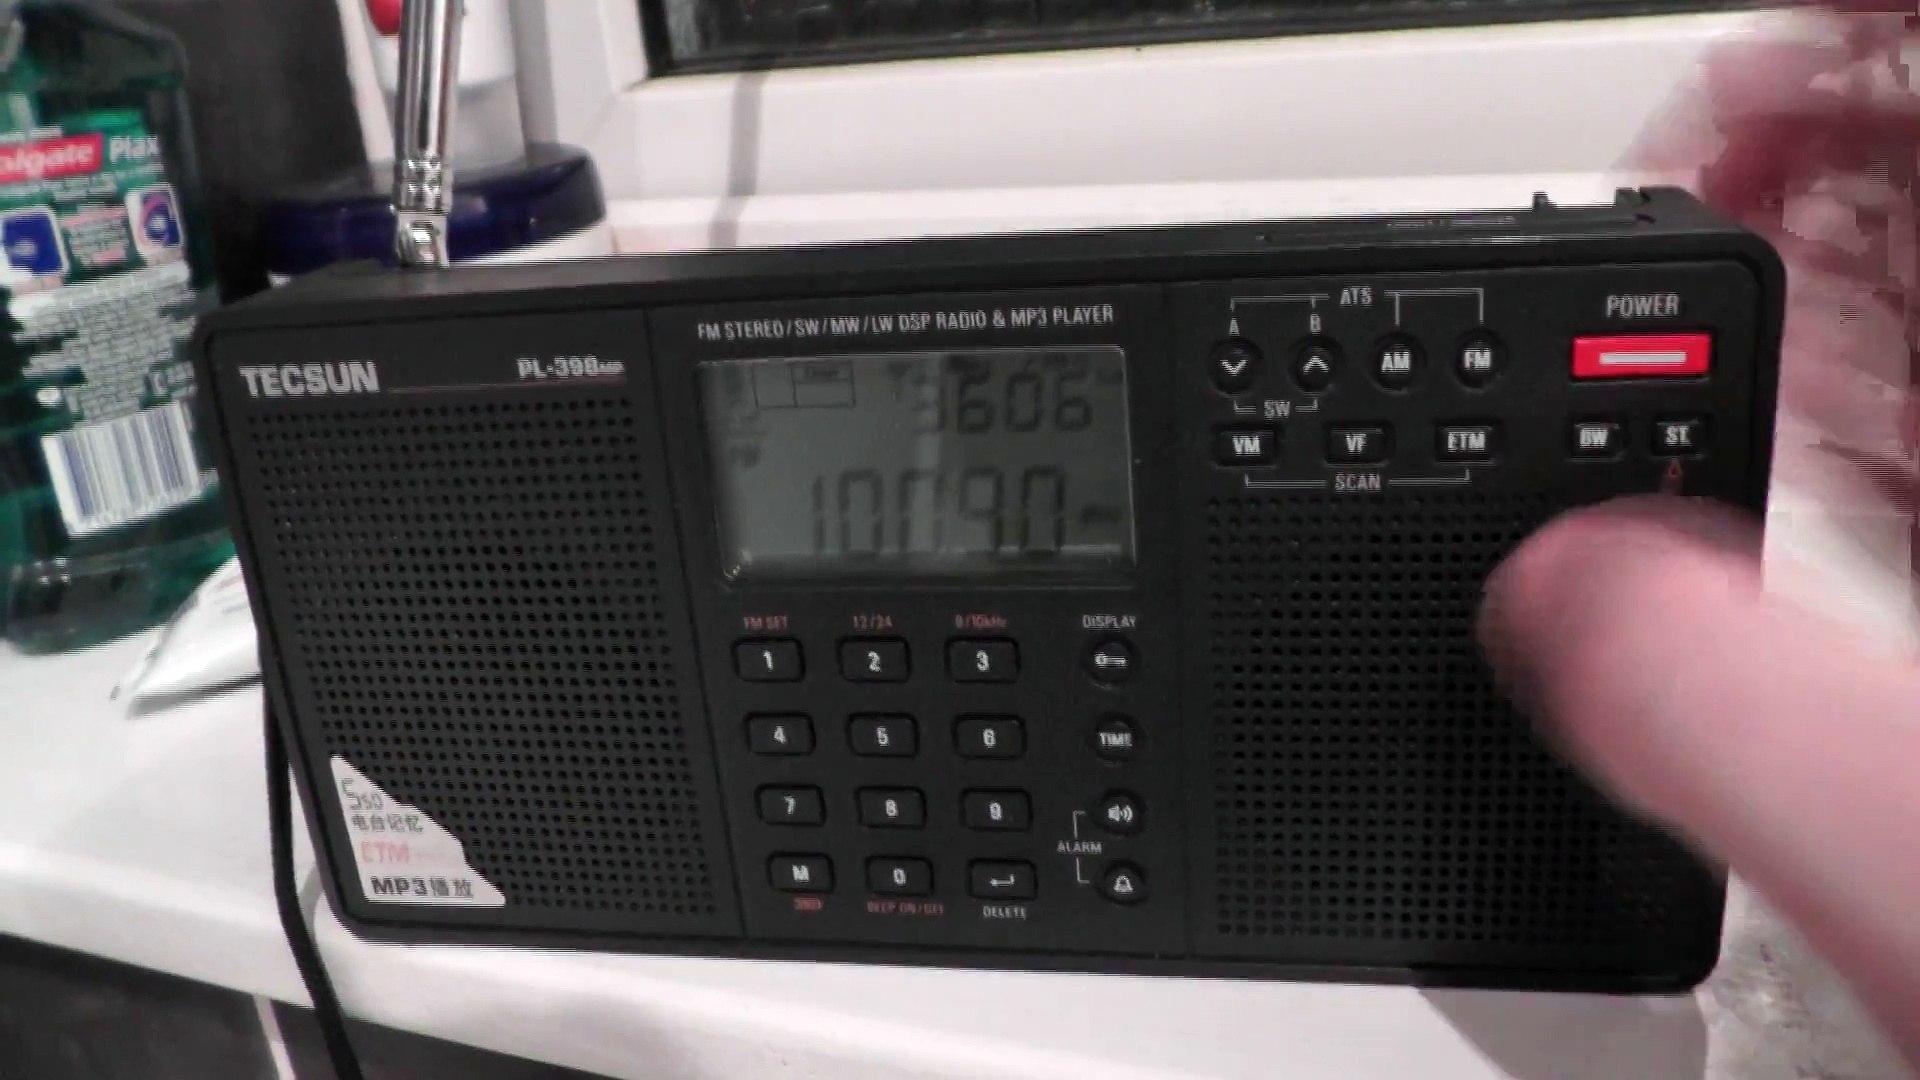 Insane Dutch FM Radio Tropo Studio Brussel station over Classic FM 100.9 picked up in Clacton_